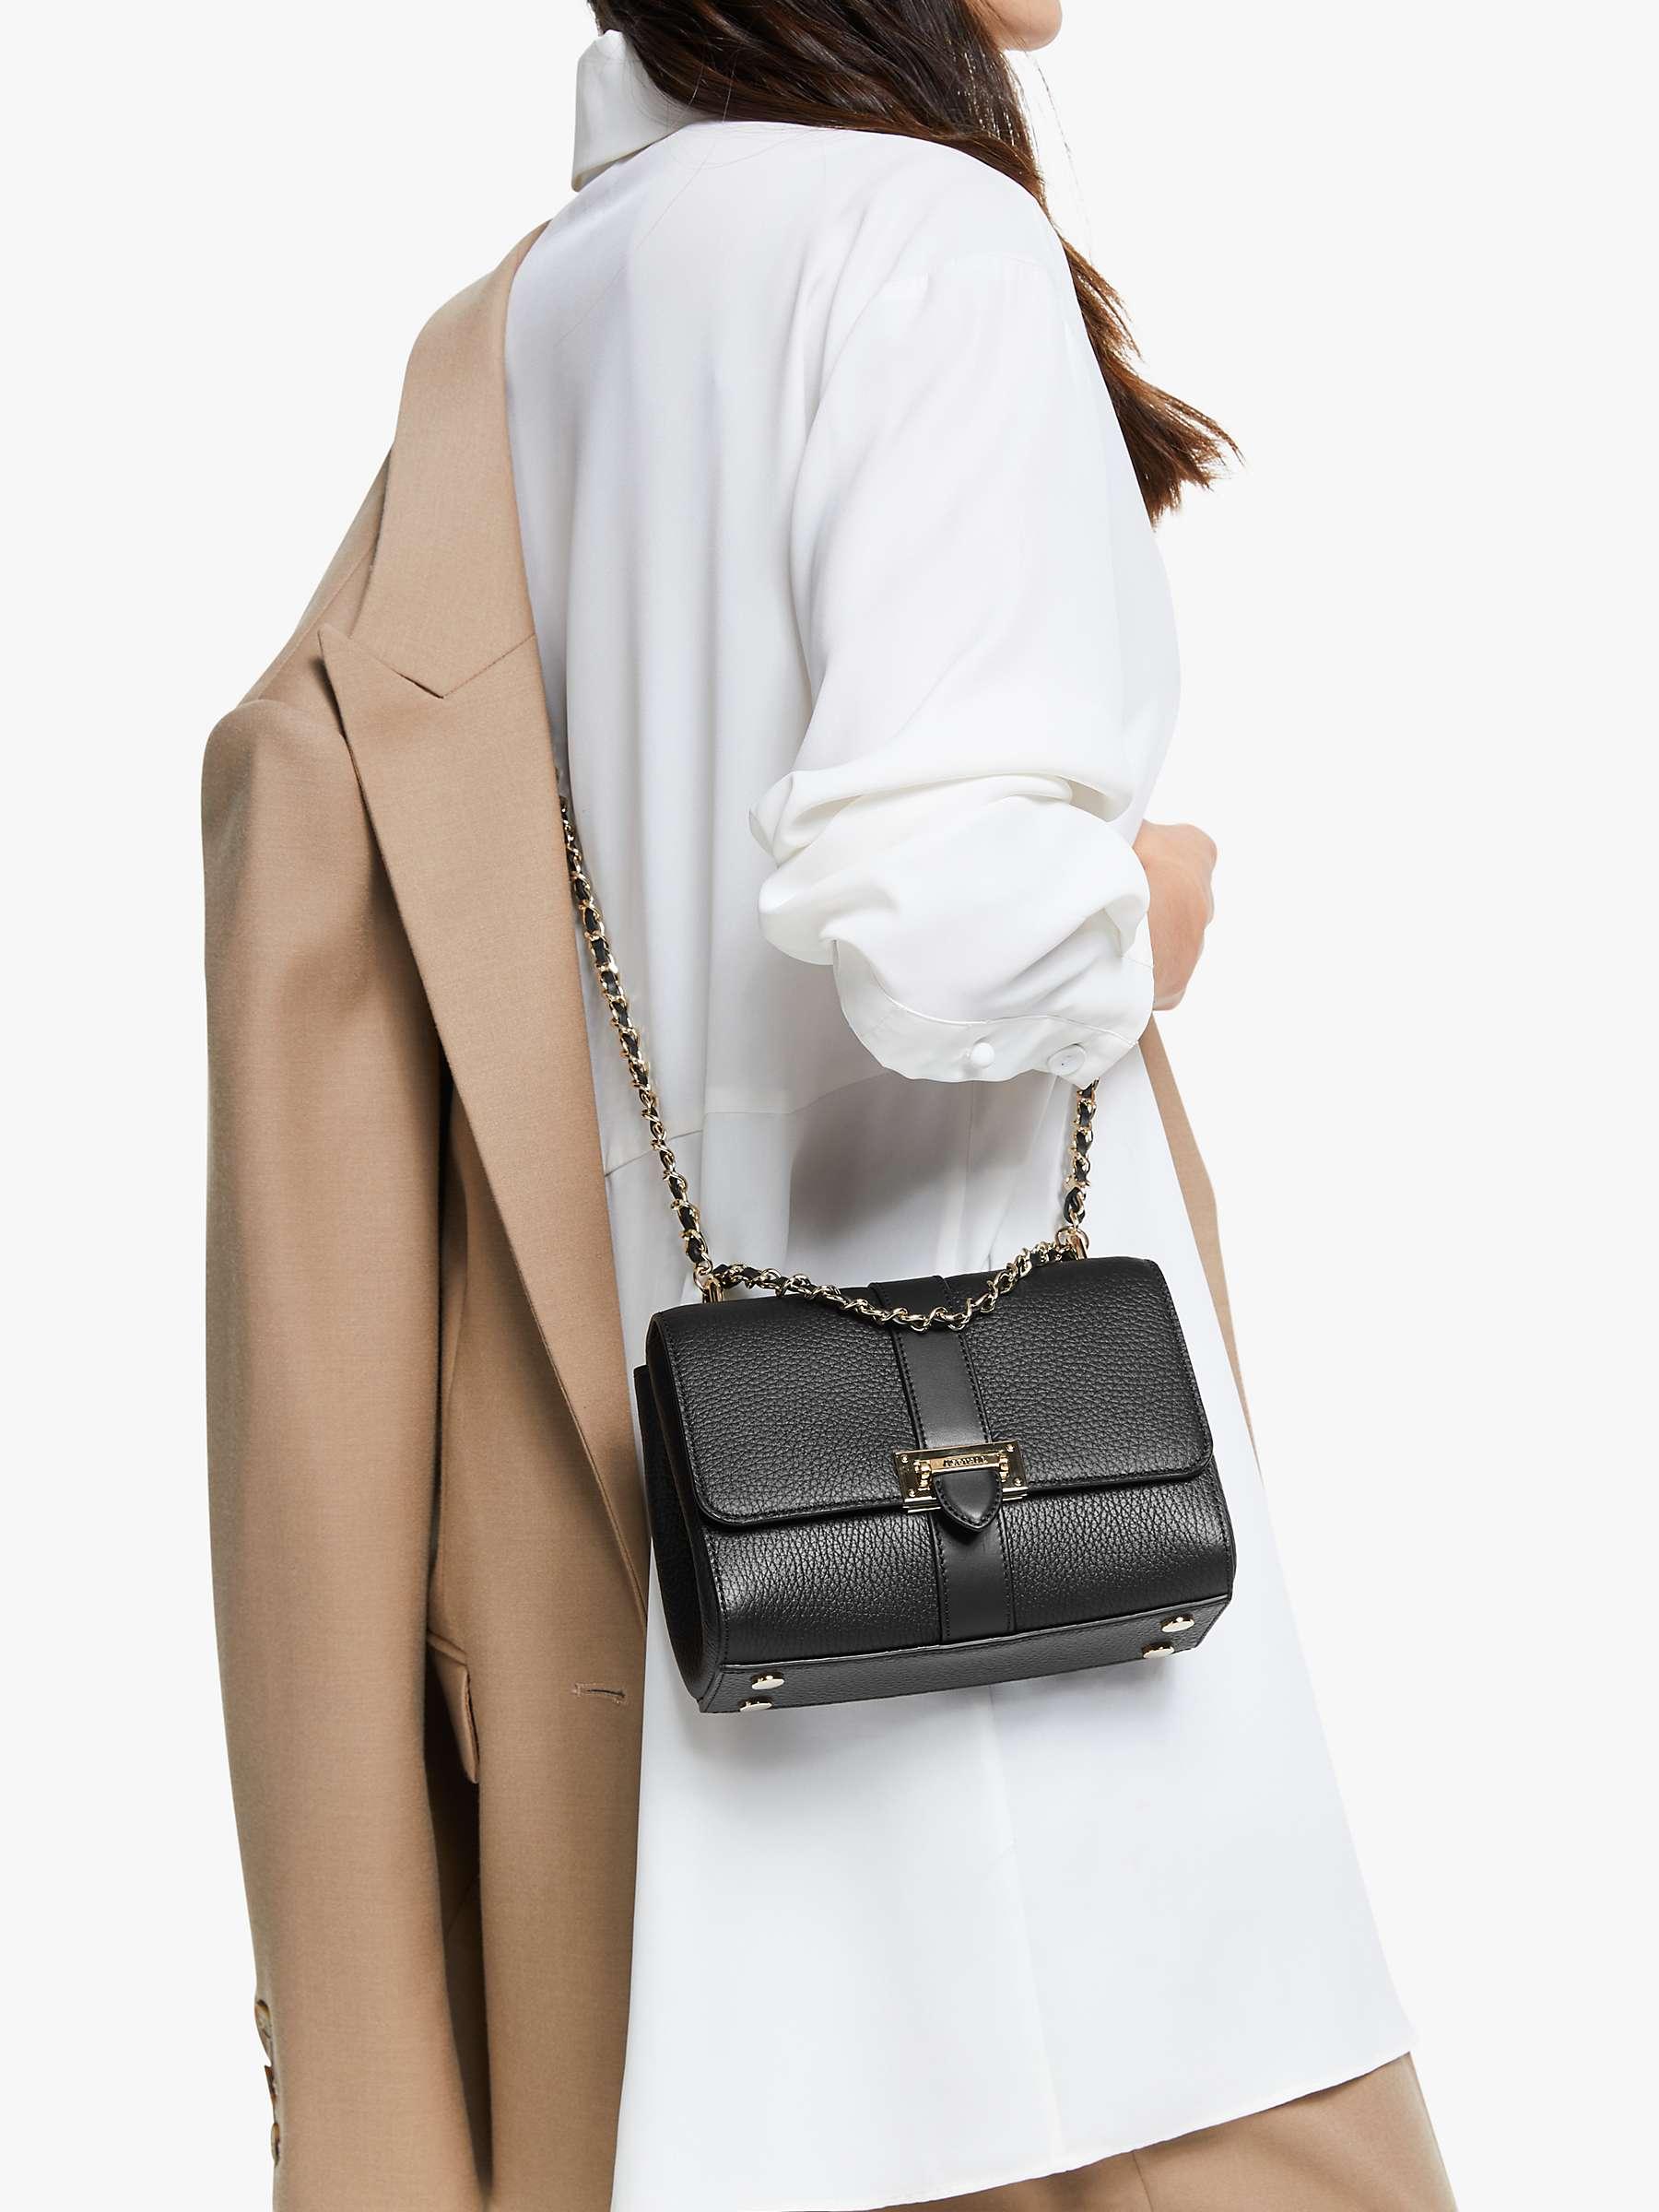 Aspinal of London Lottie Small Pebble Leather Shoulder Bag, Black ...